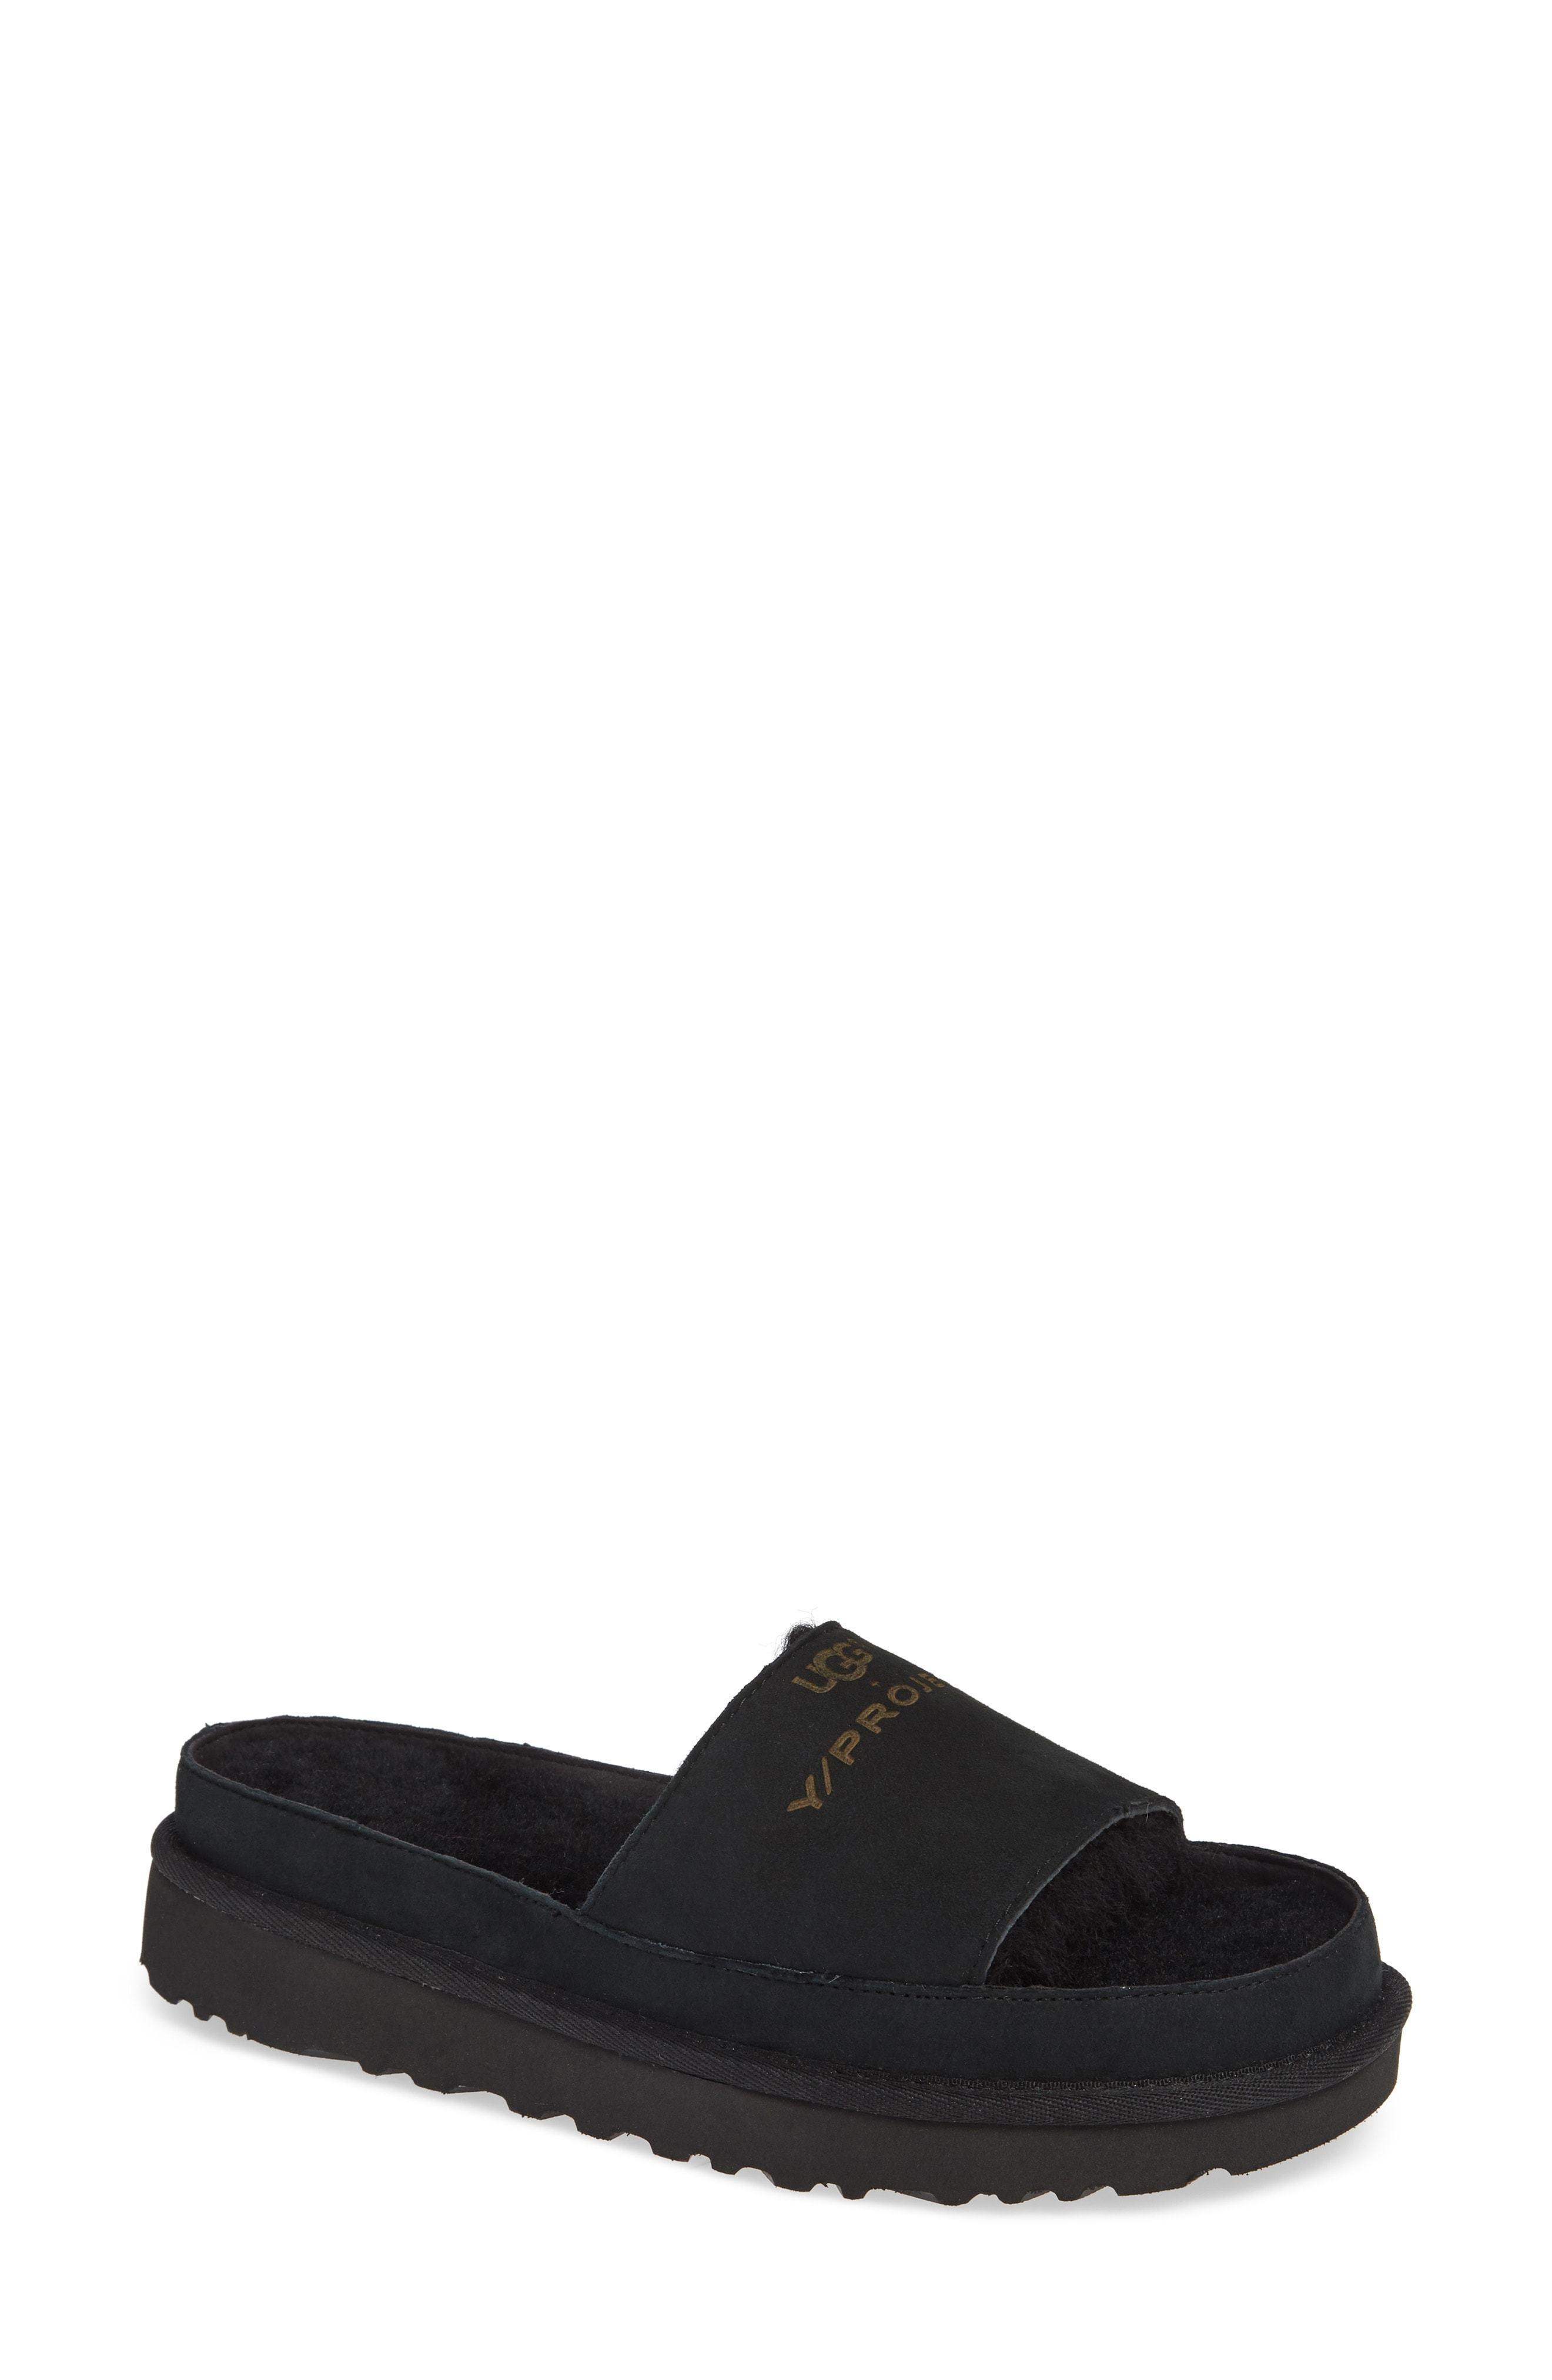 1b6791babd5 X Ugg Genuine Shearling Slide Sandal